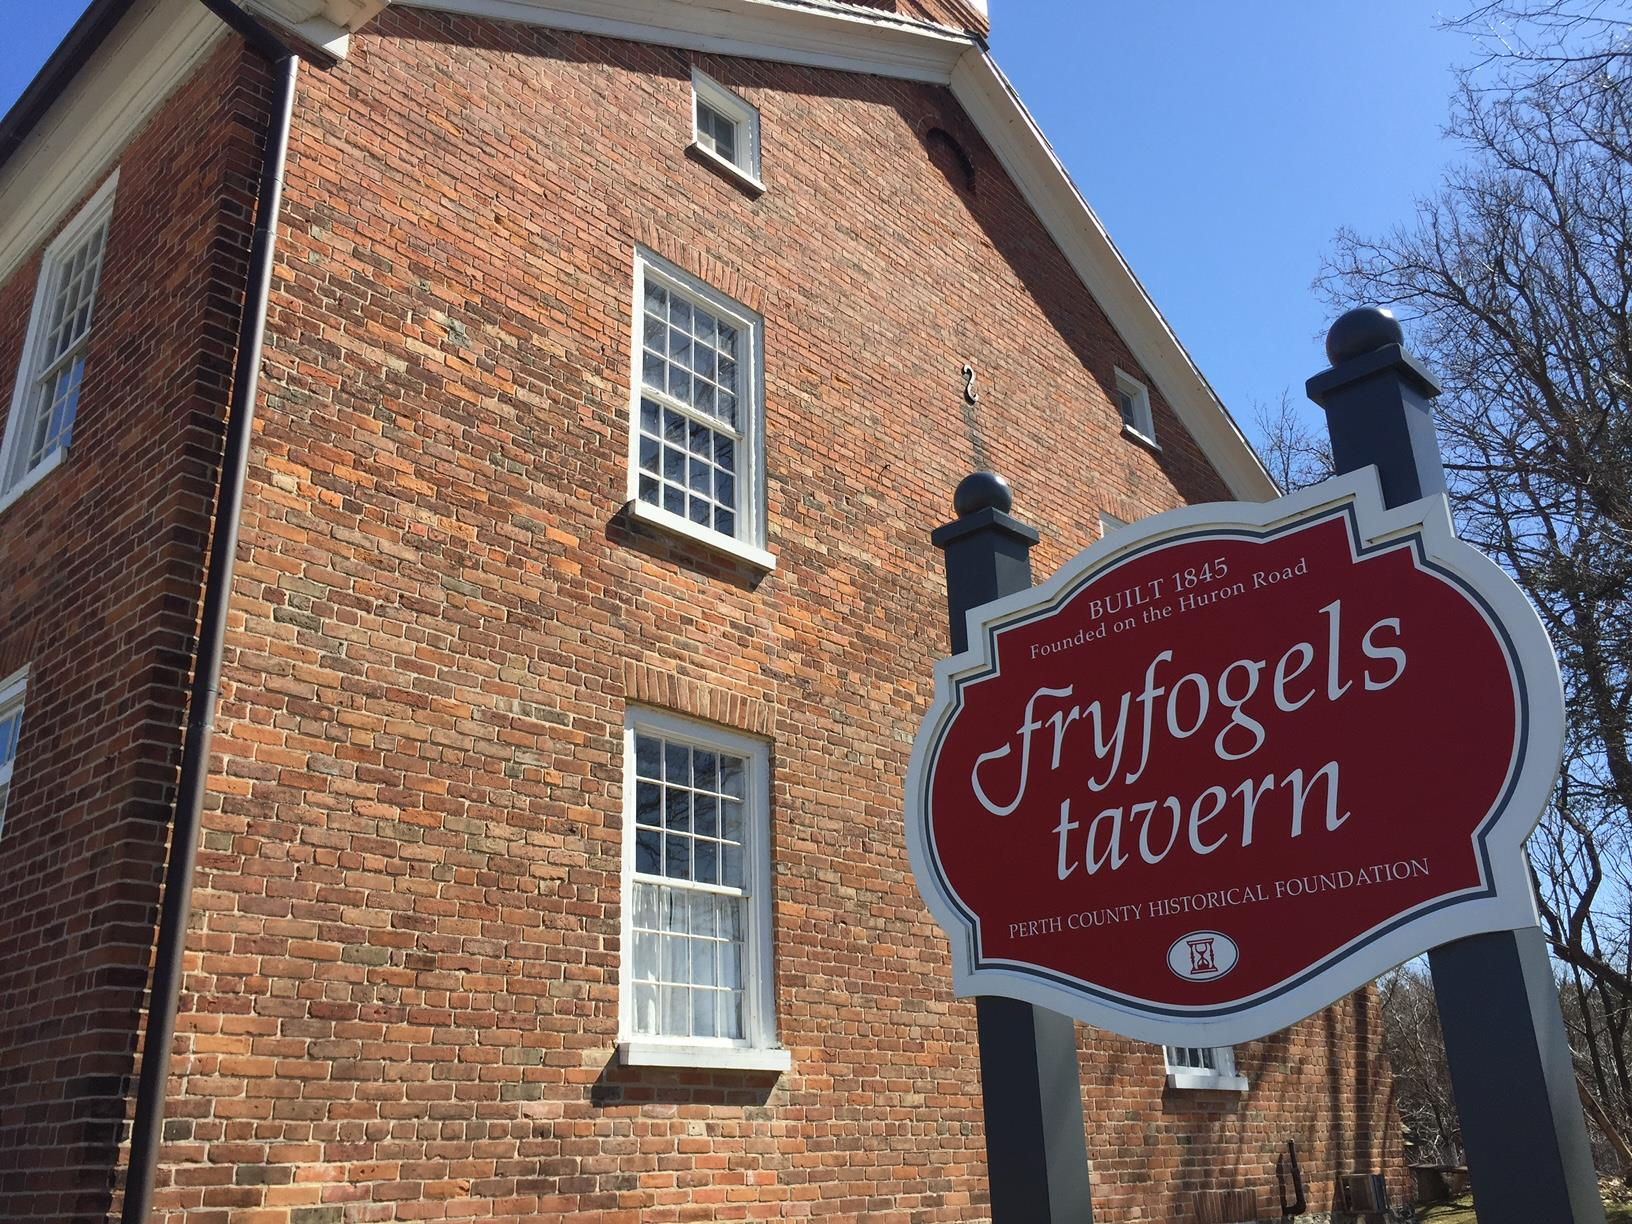 The Fryfogel Tavern Matters